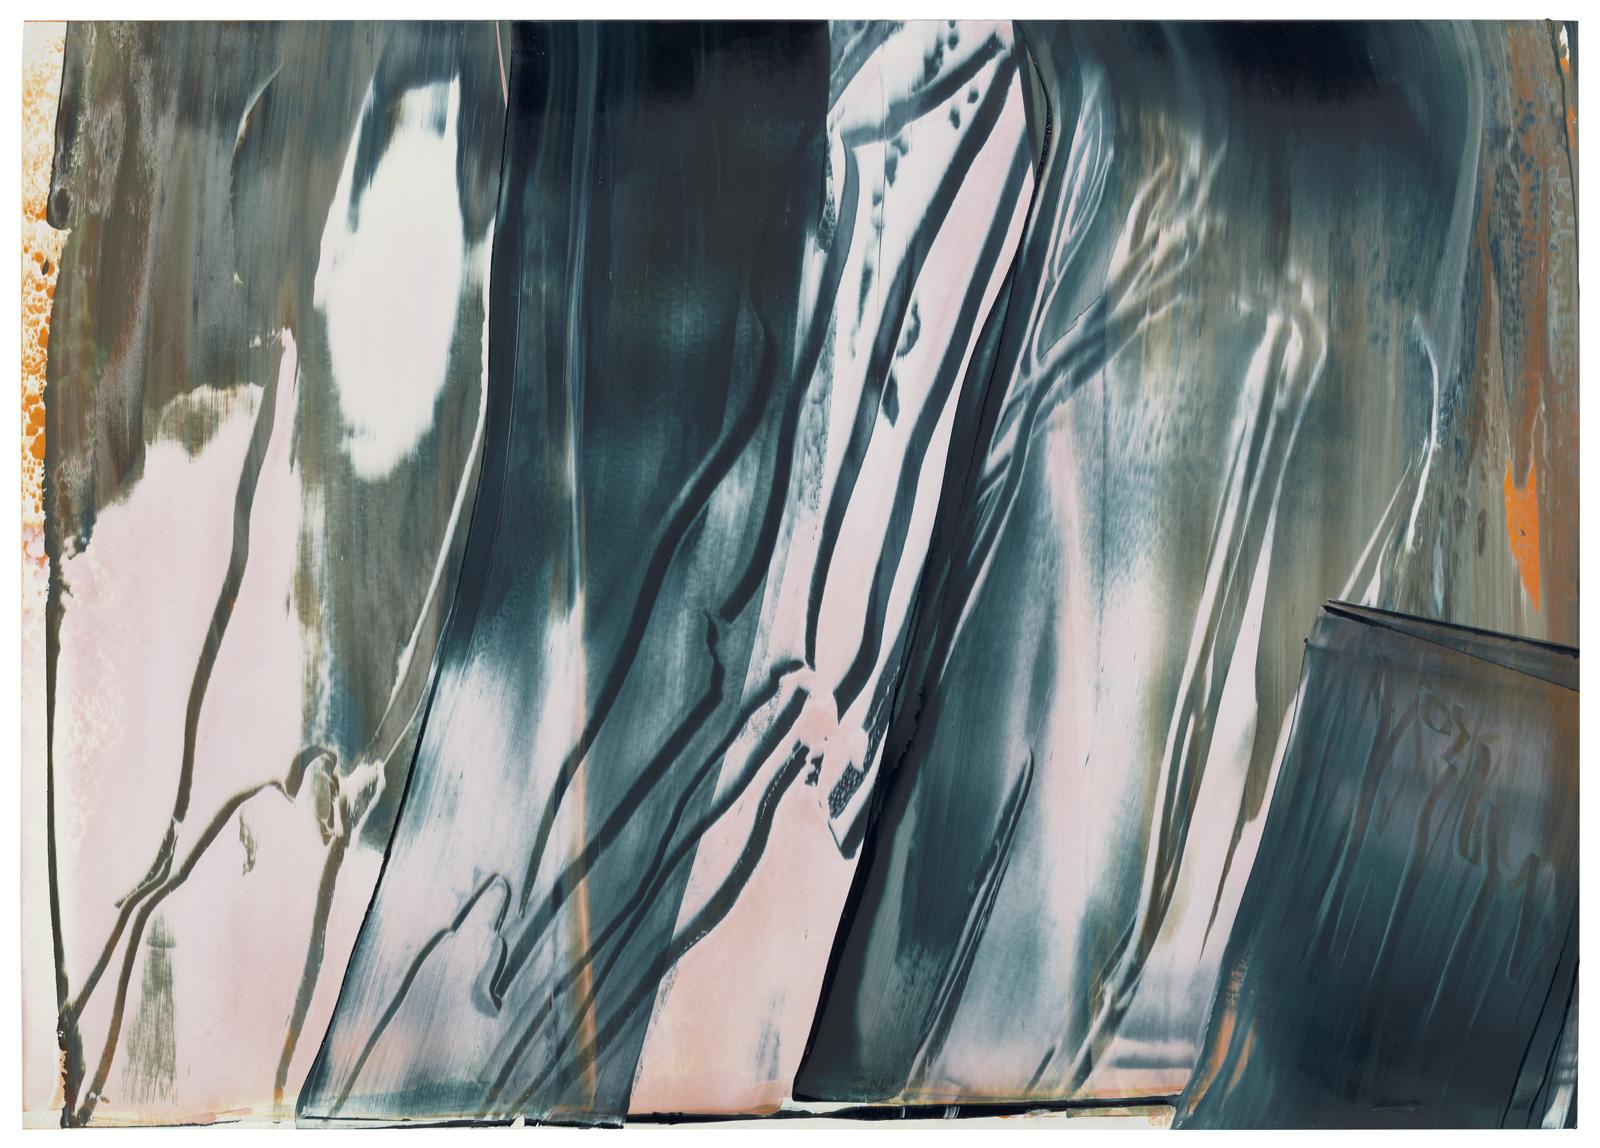 Yangtsekiang II, Öl auf Papier, 50x70cm, 2019